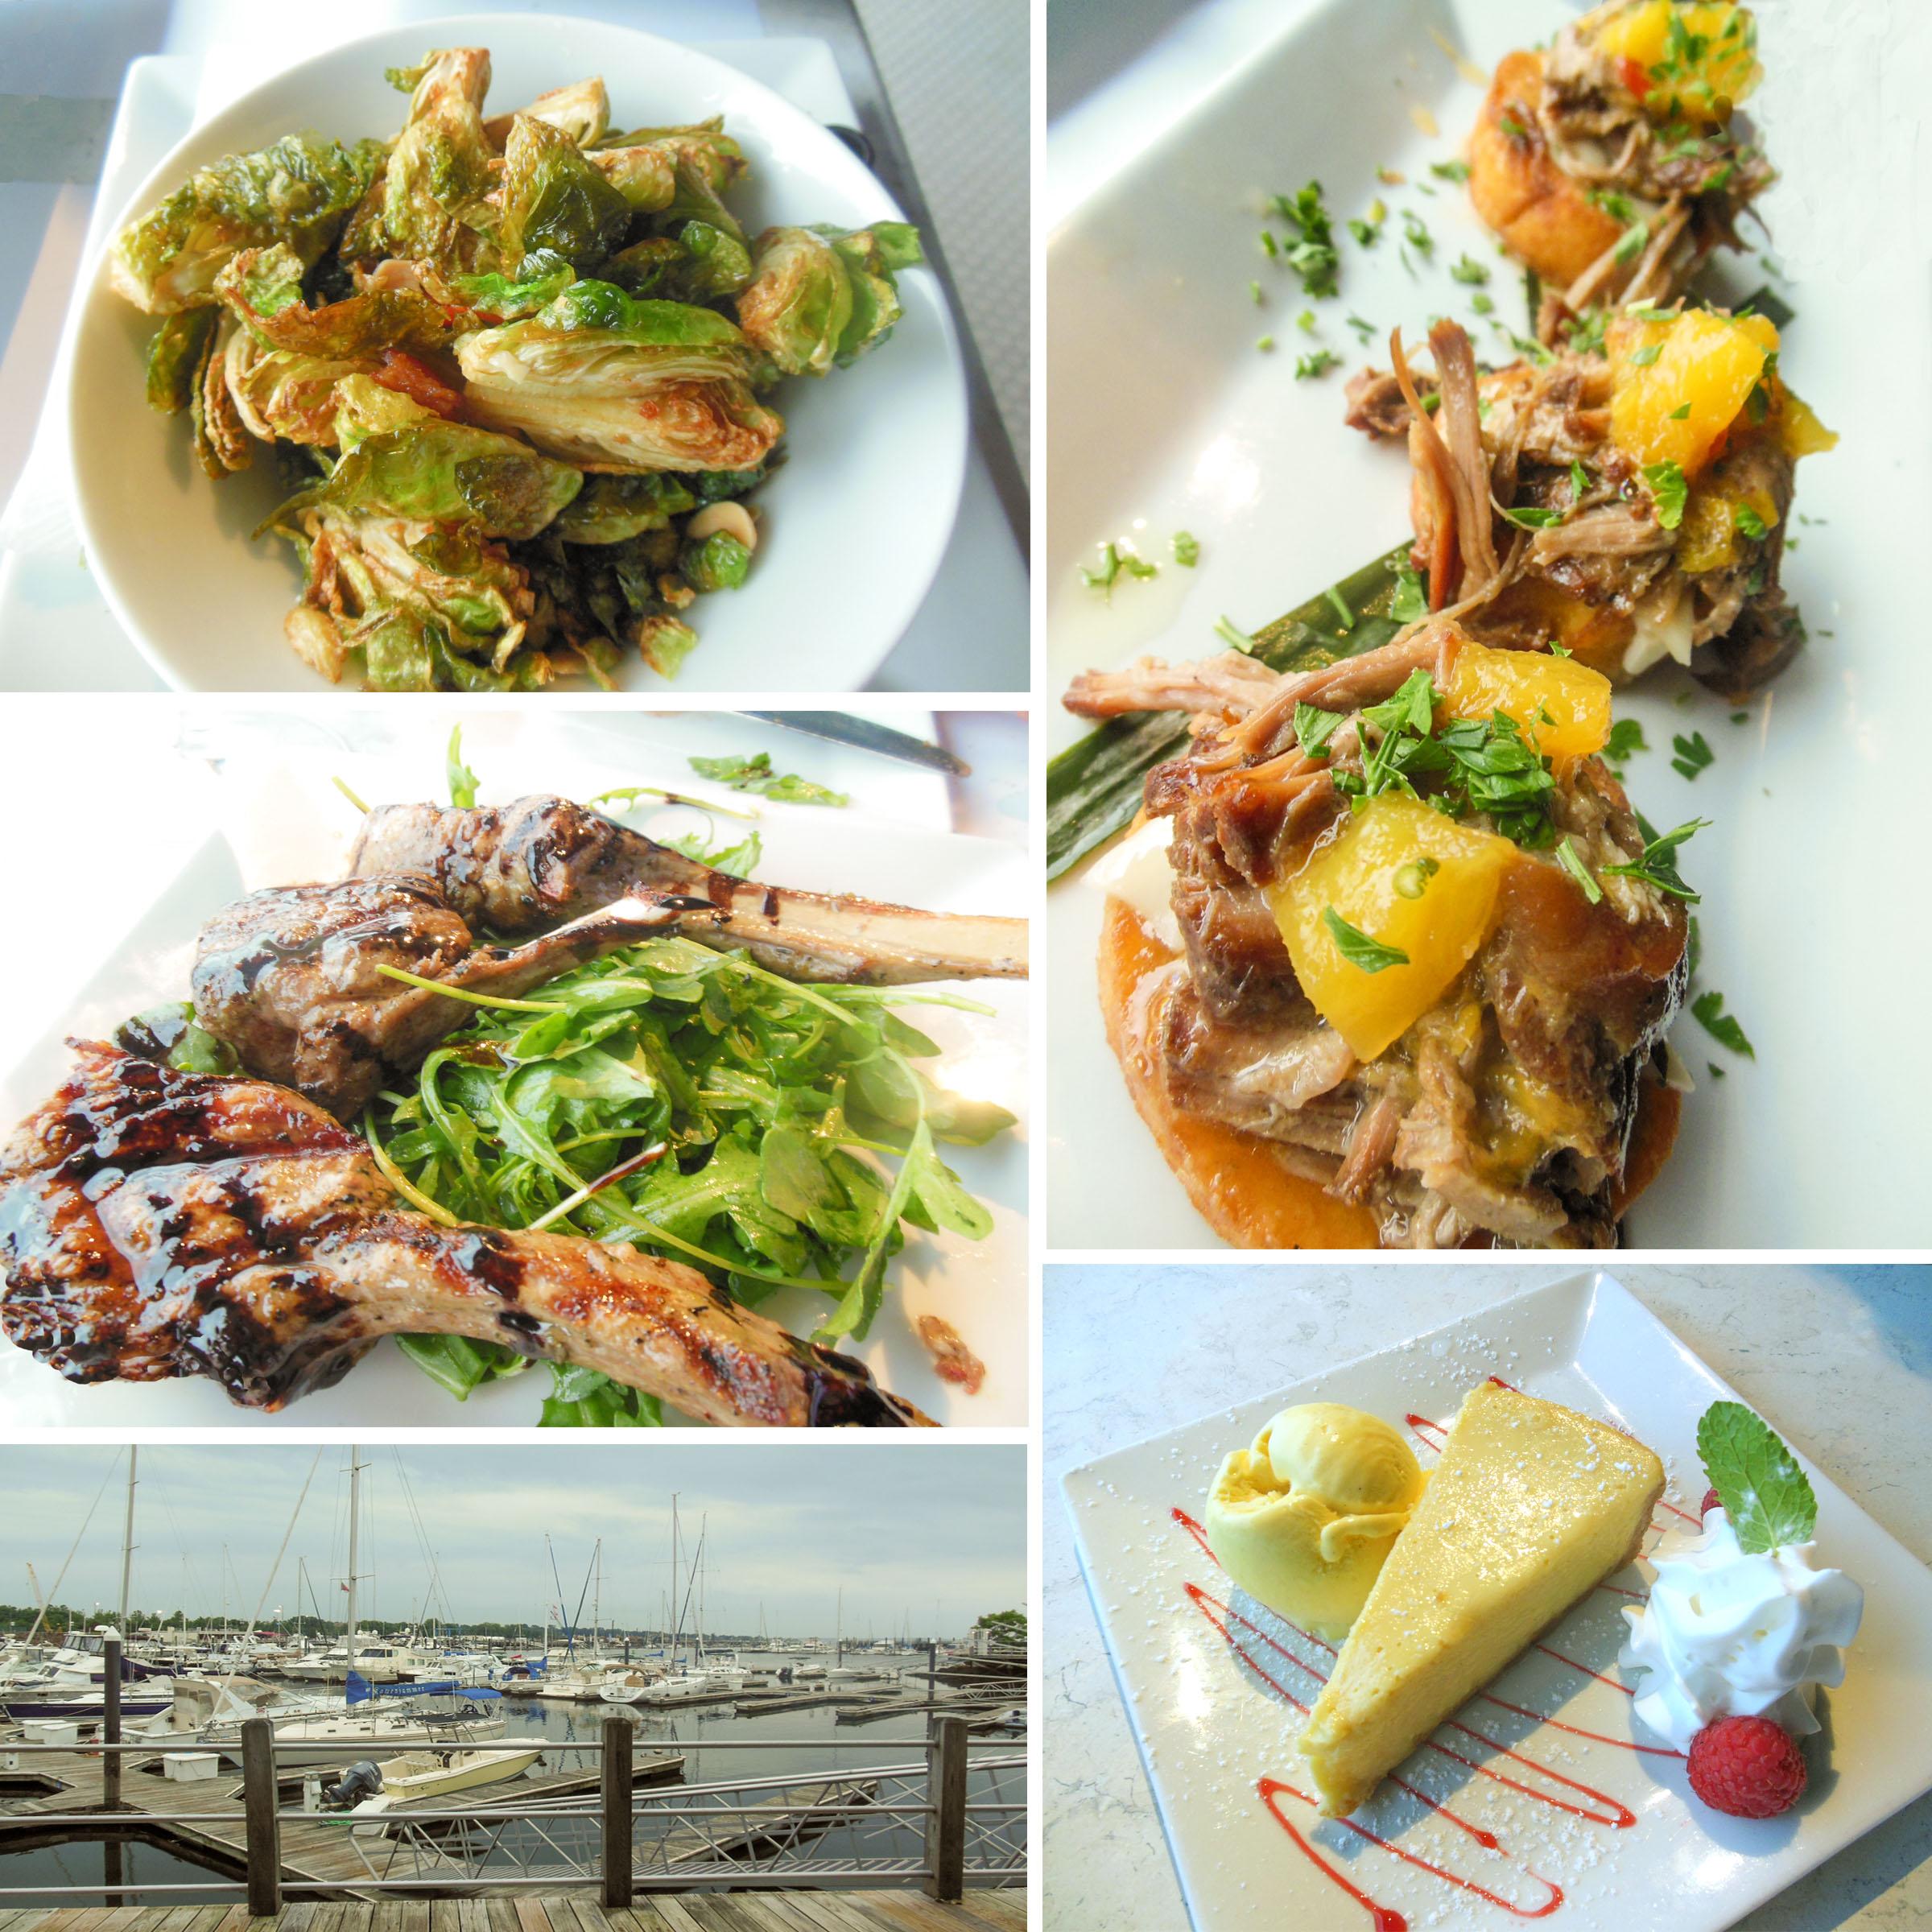 Stamford's Waterfront Dining Scene